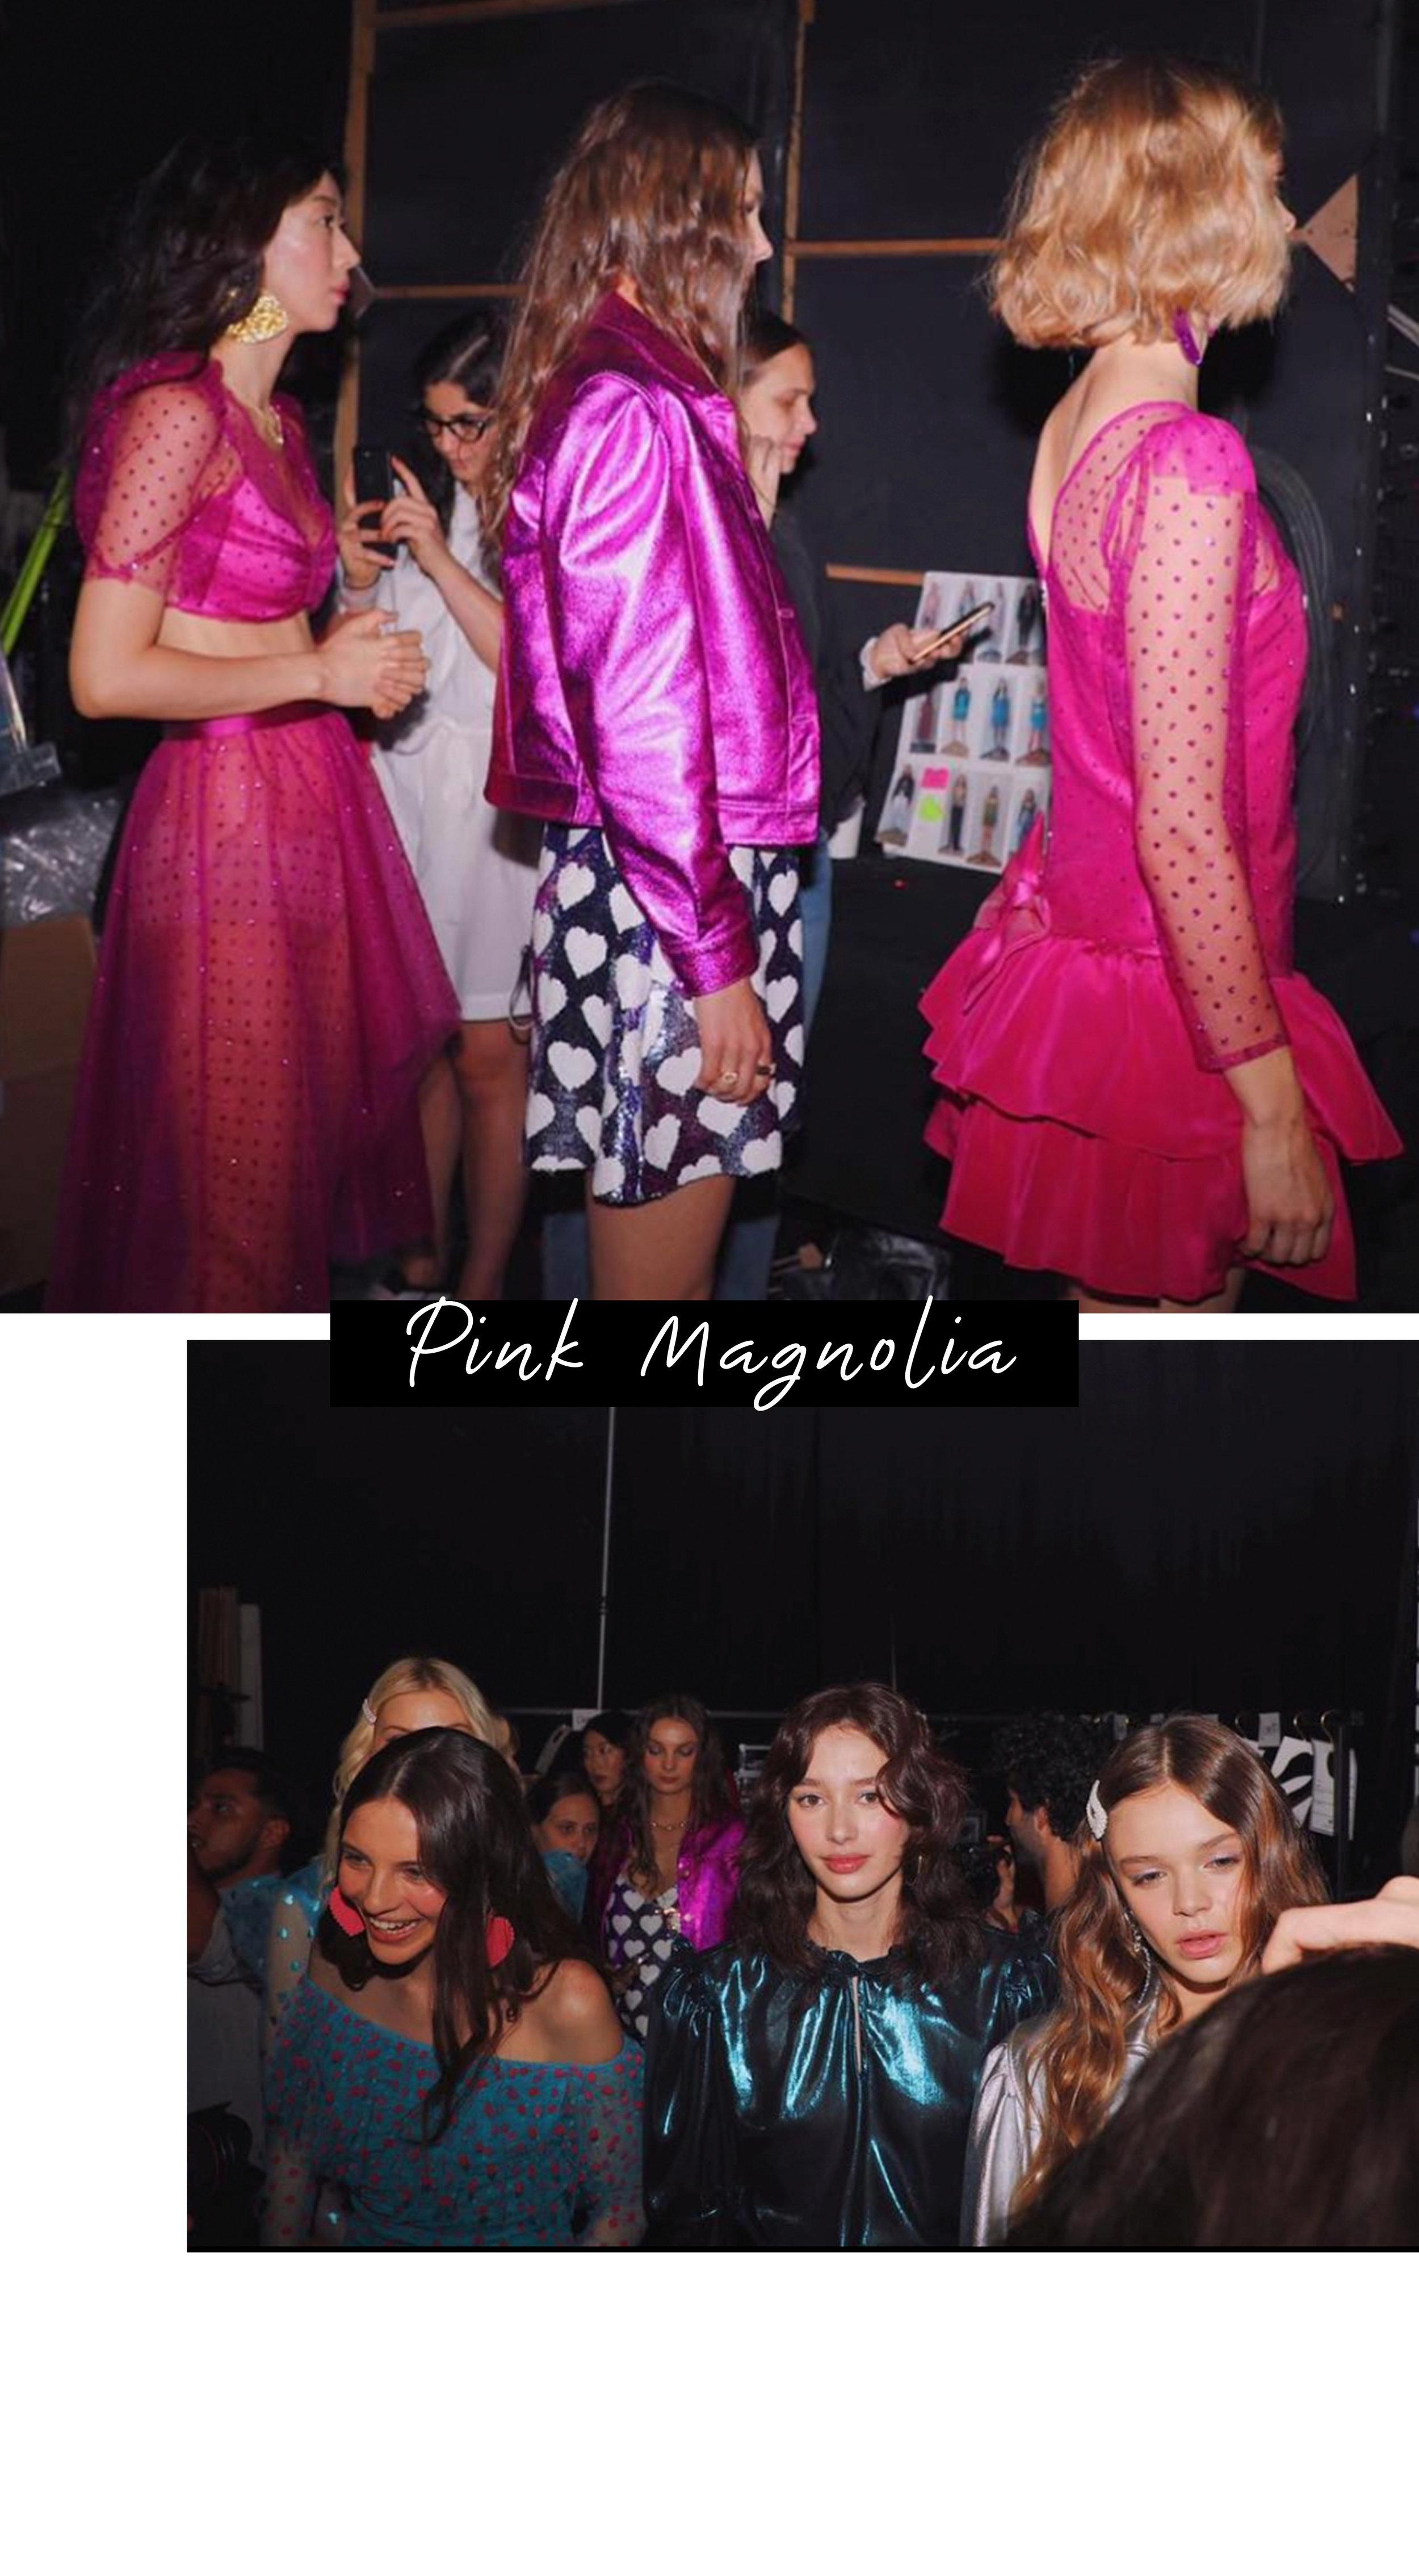 Foto: Pink Magnolia